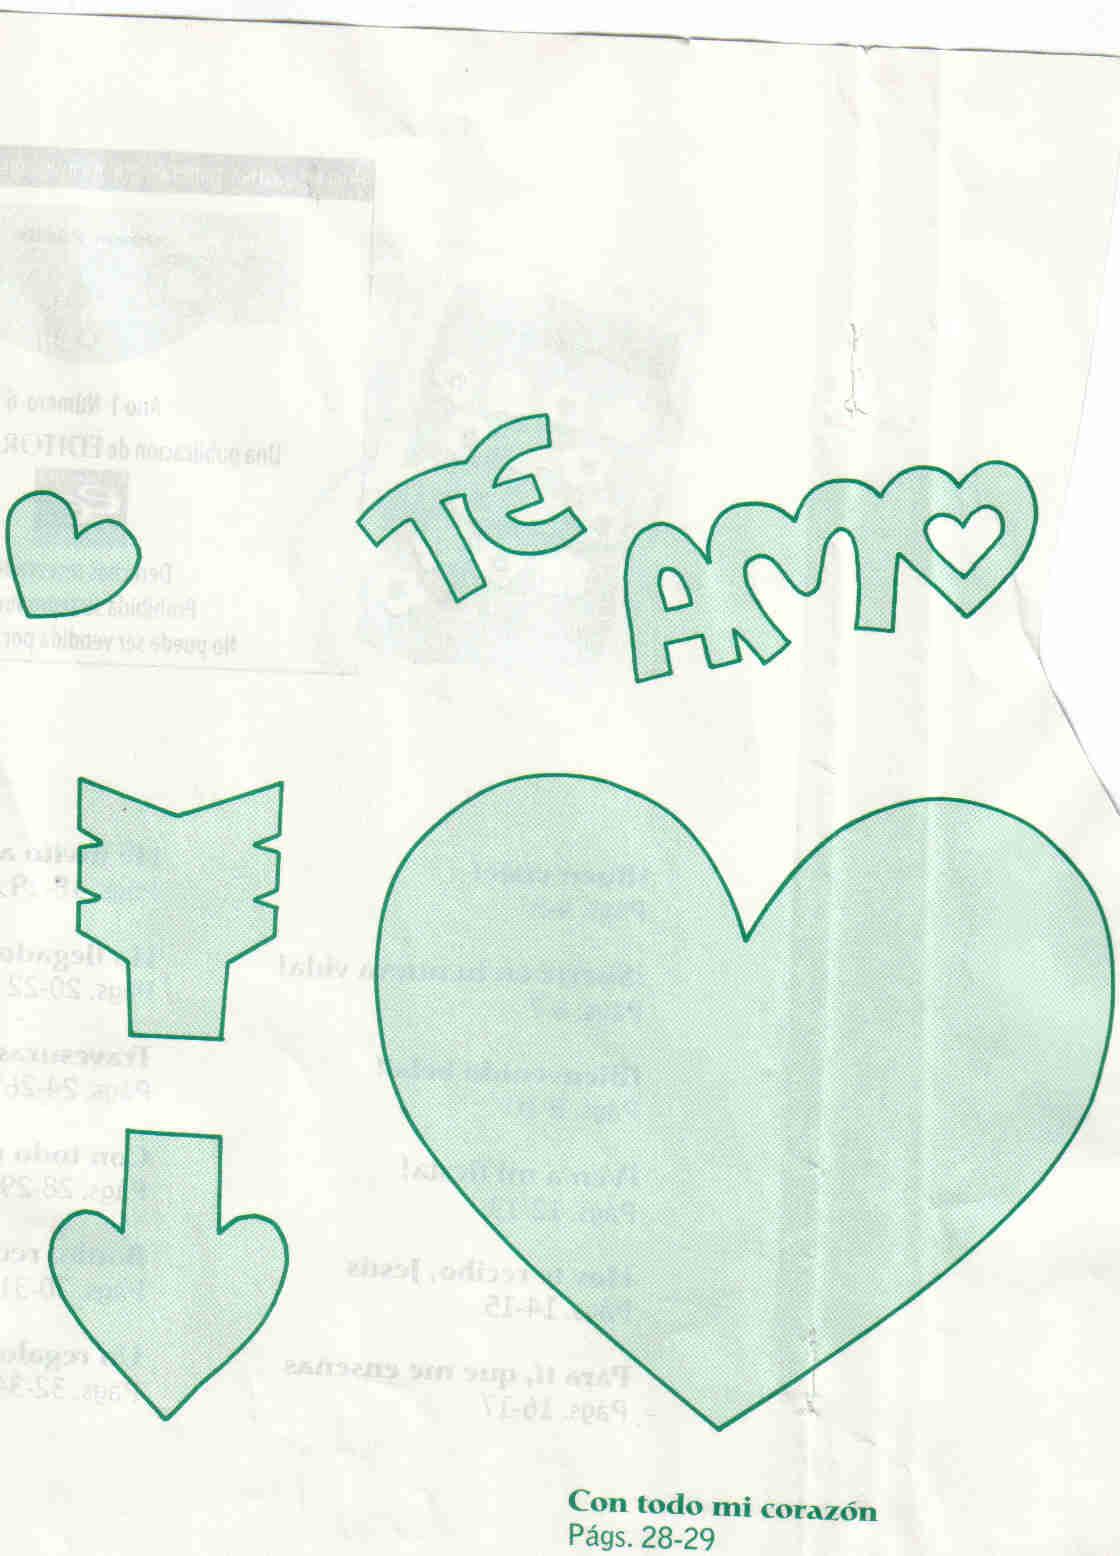 corazon san valentin Corazon TE AMO de San Valentin